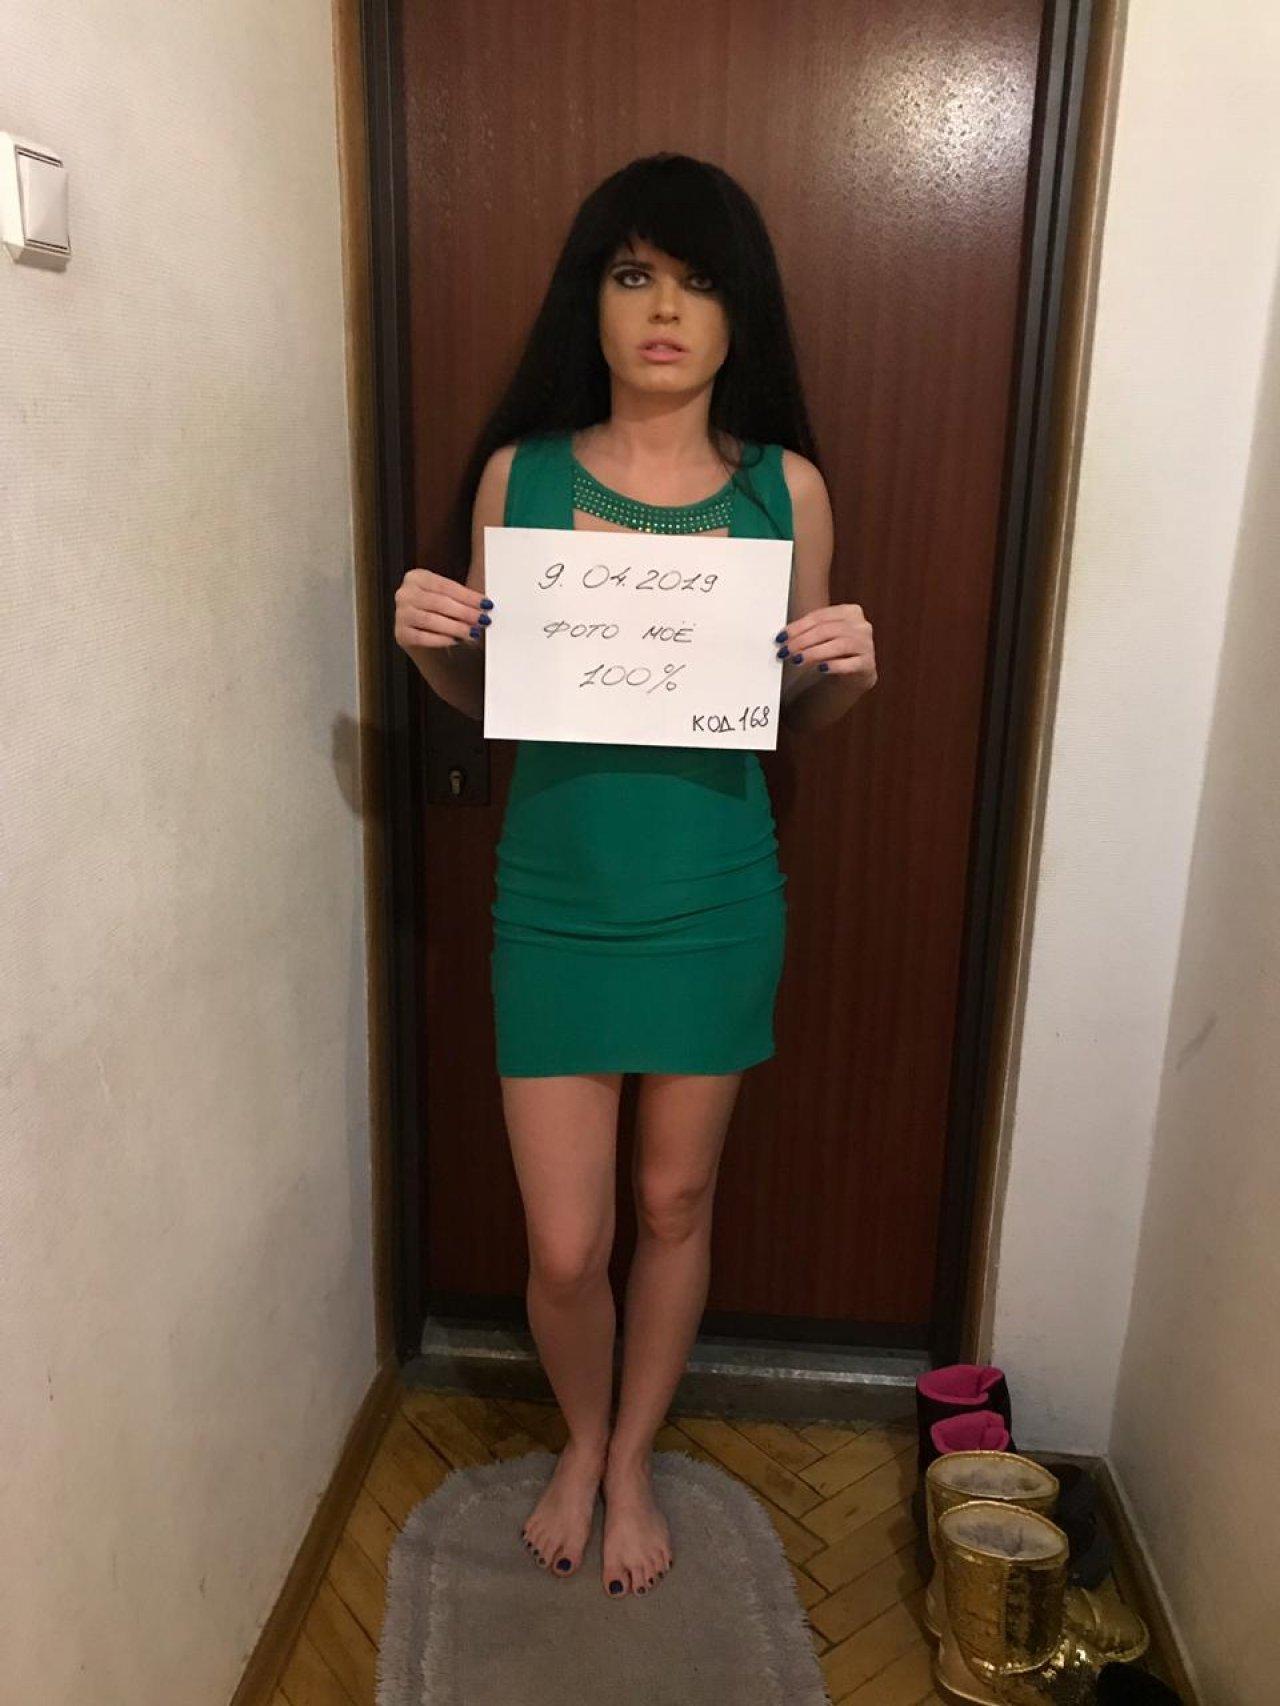 Проститутка КСЮША - Балашиха